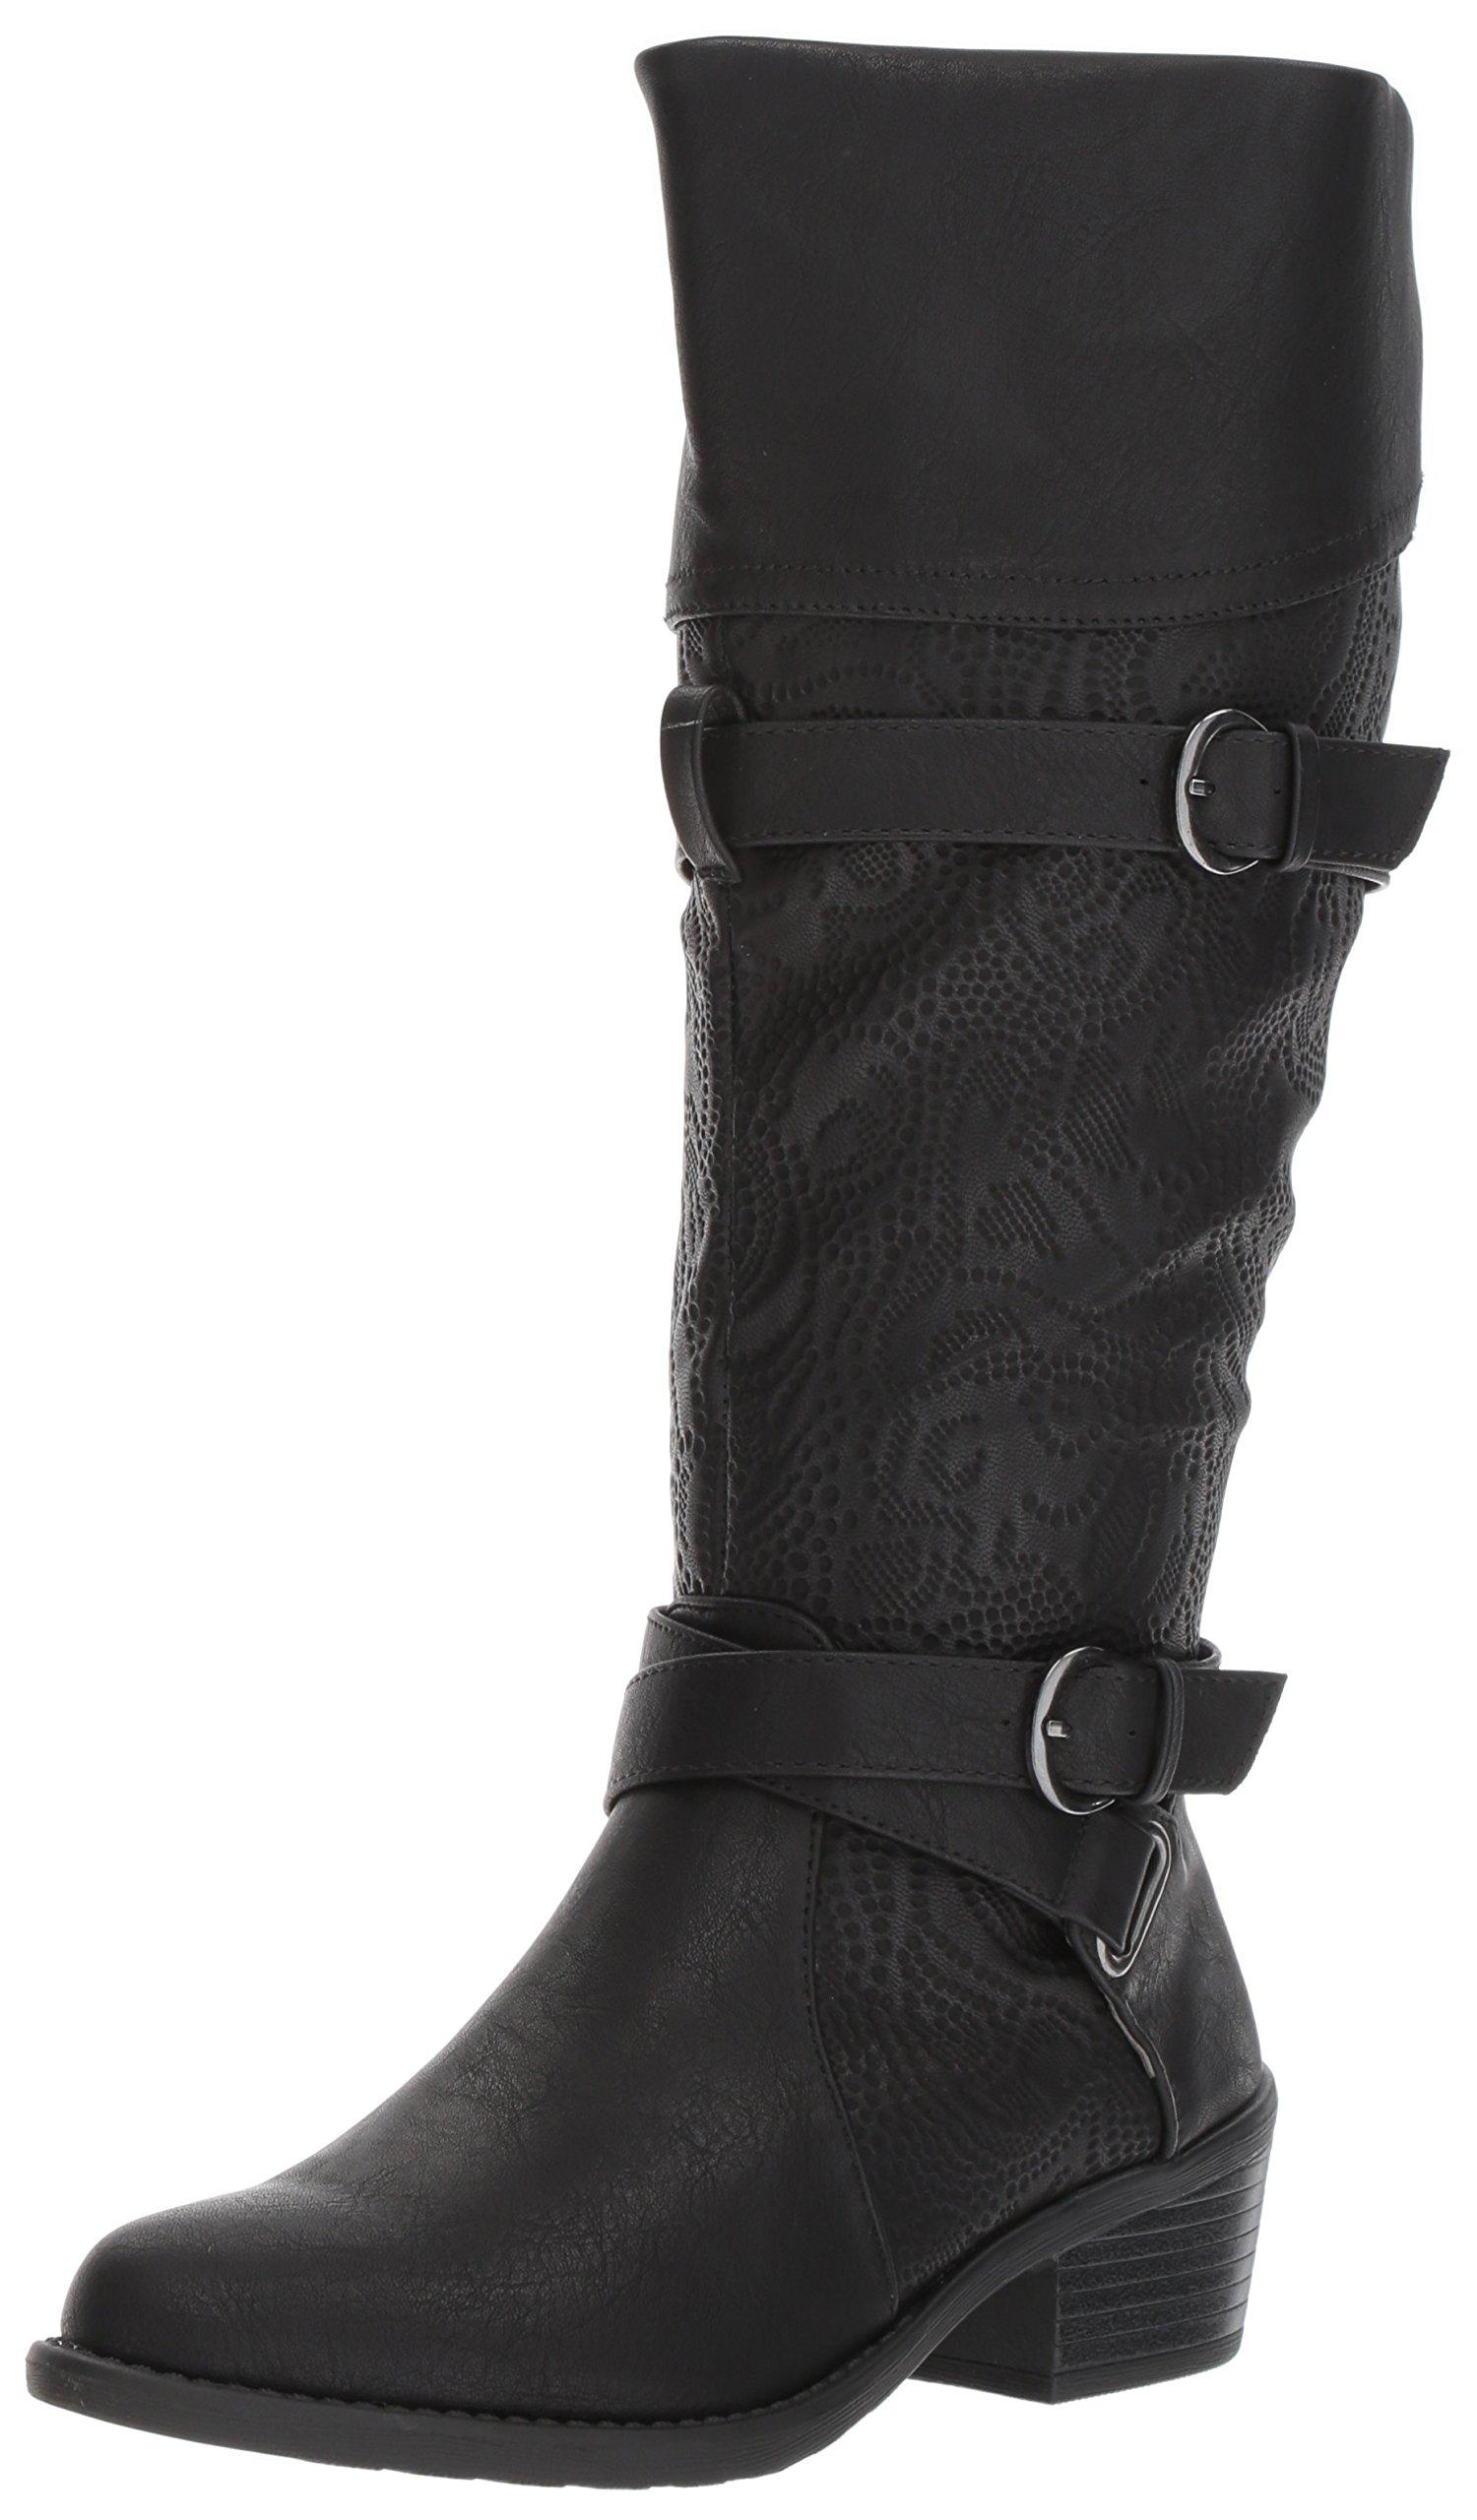 Easy Street Women's Kelsa Plus Harness Boot, Black/Embossed, 9.5 W US